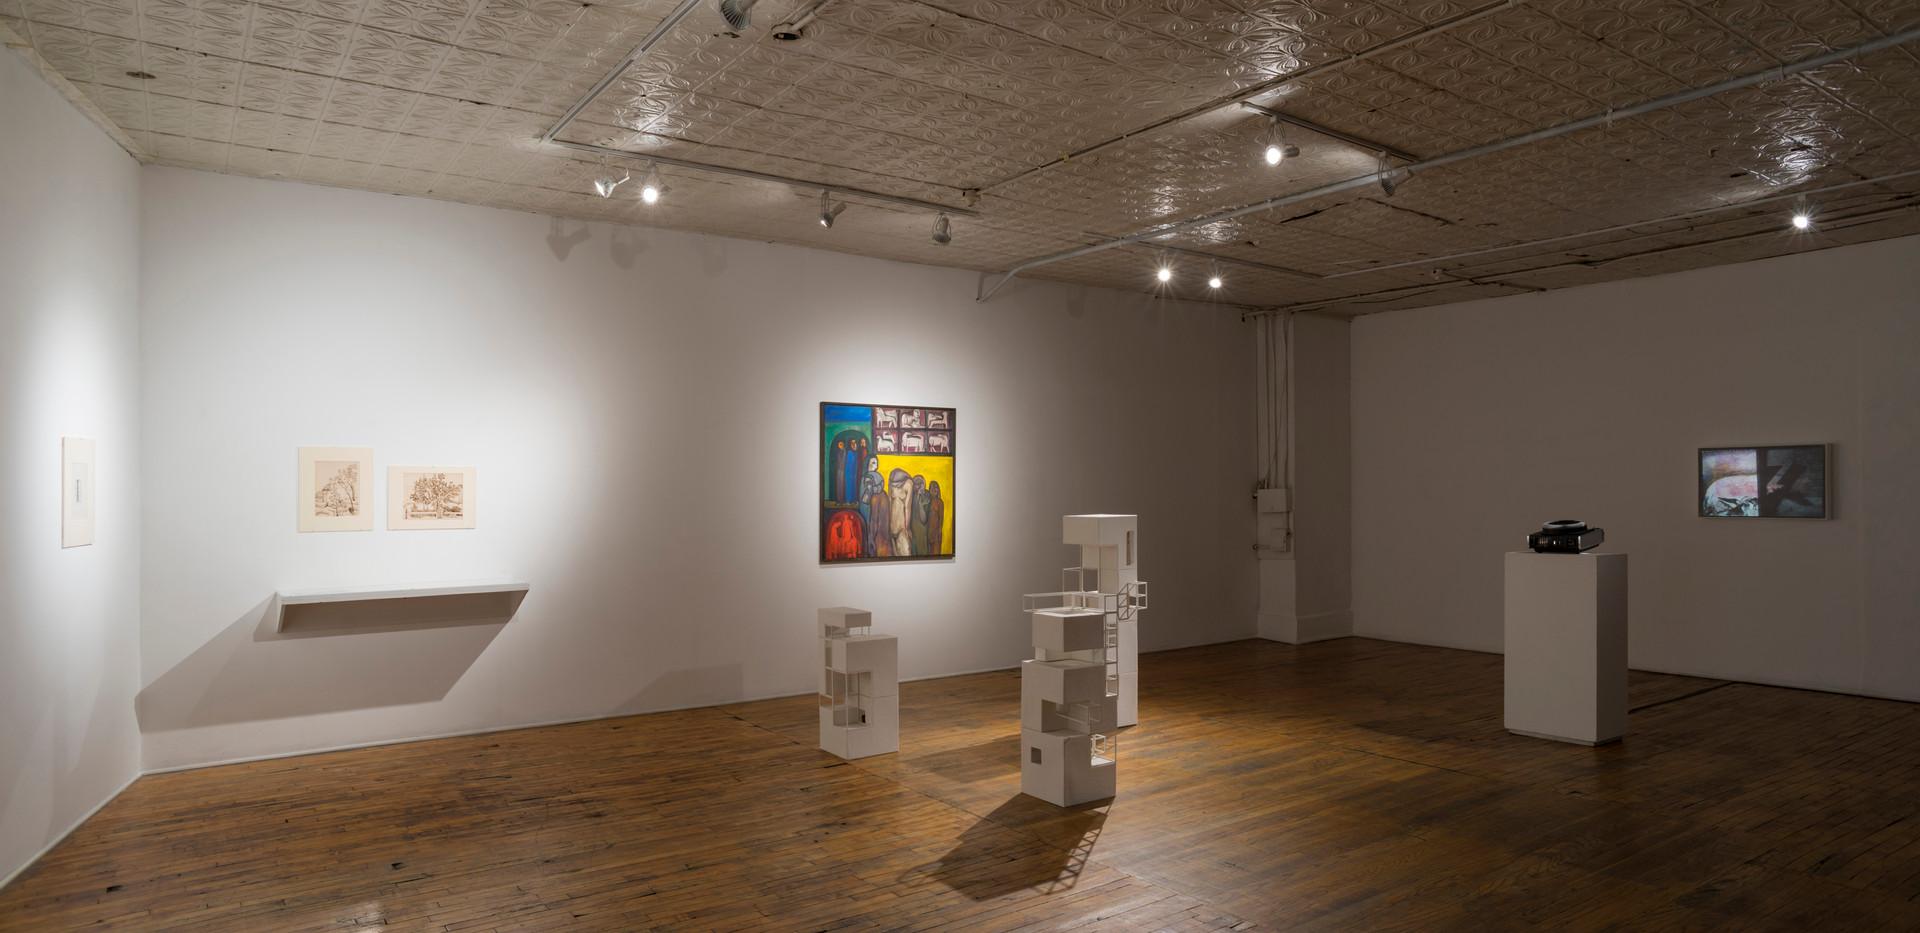 Installation View, Sedentary Fragmentation